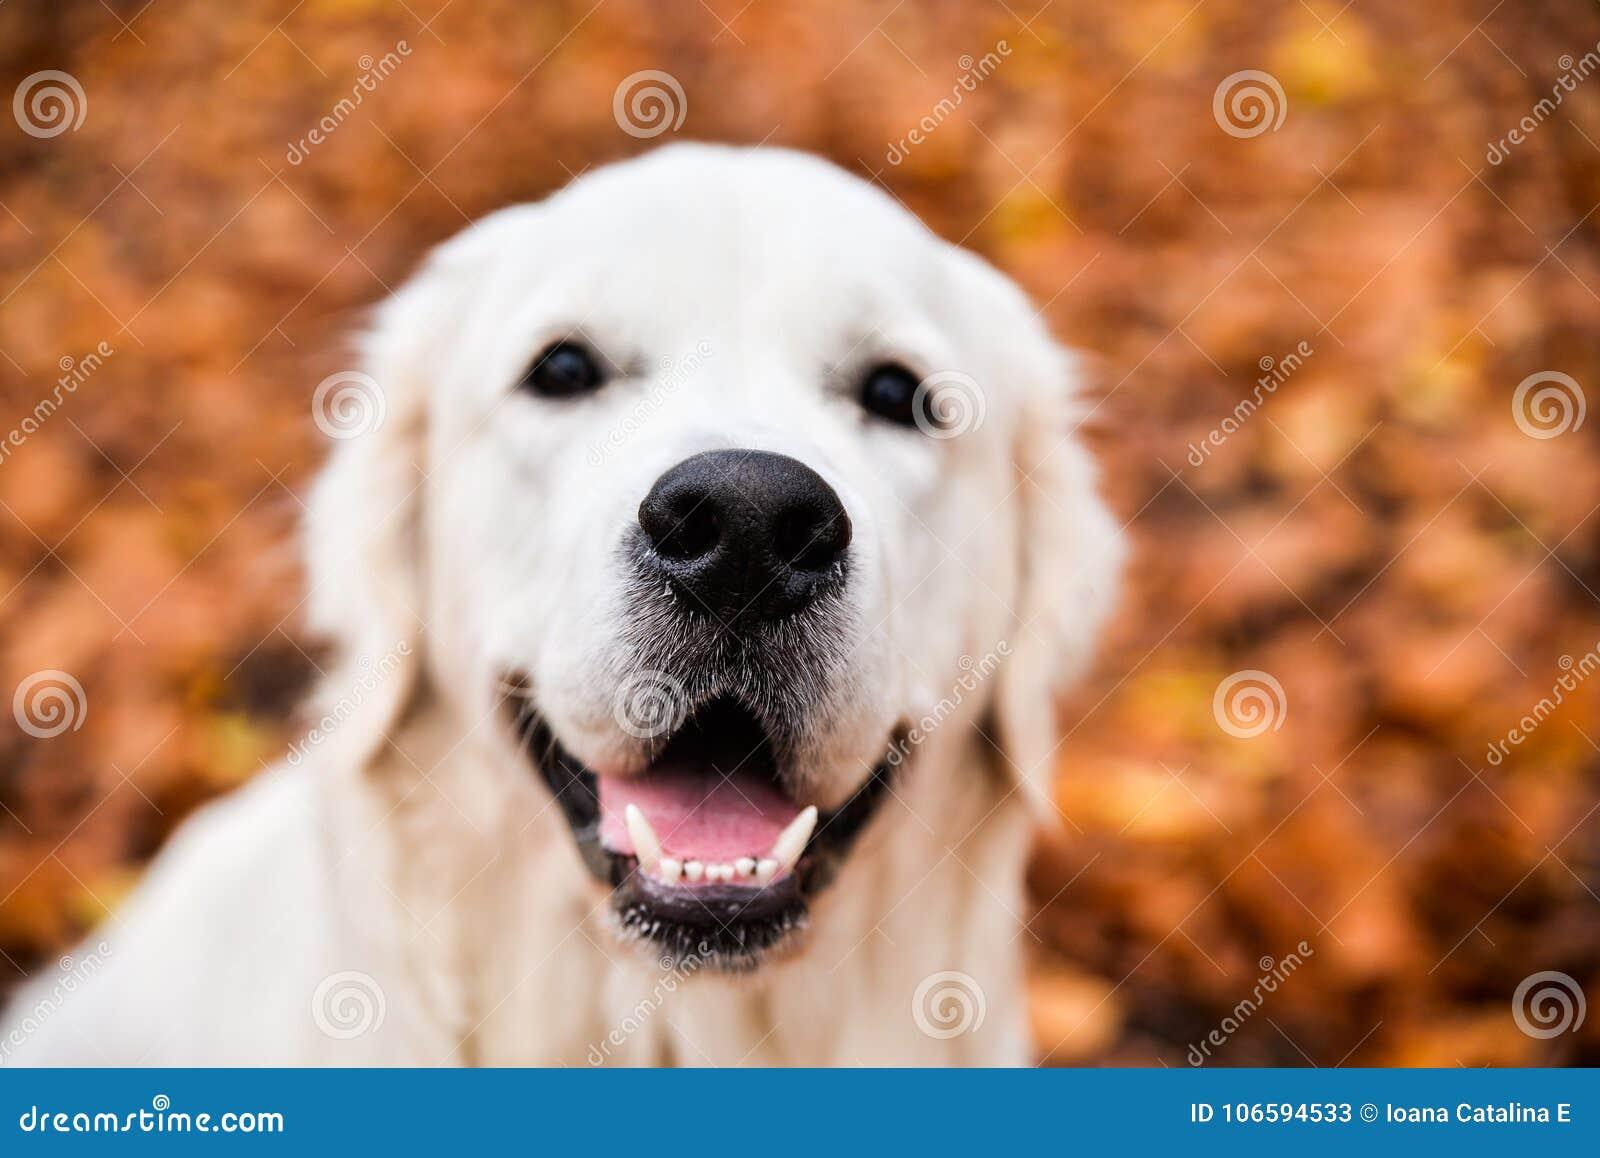 Golden Retriever S Nose Closeup Stock Image Image Of Loyal Mouth